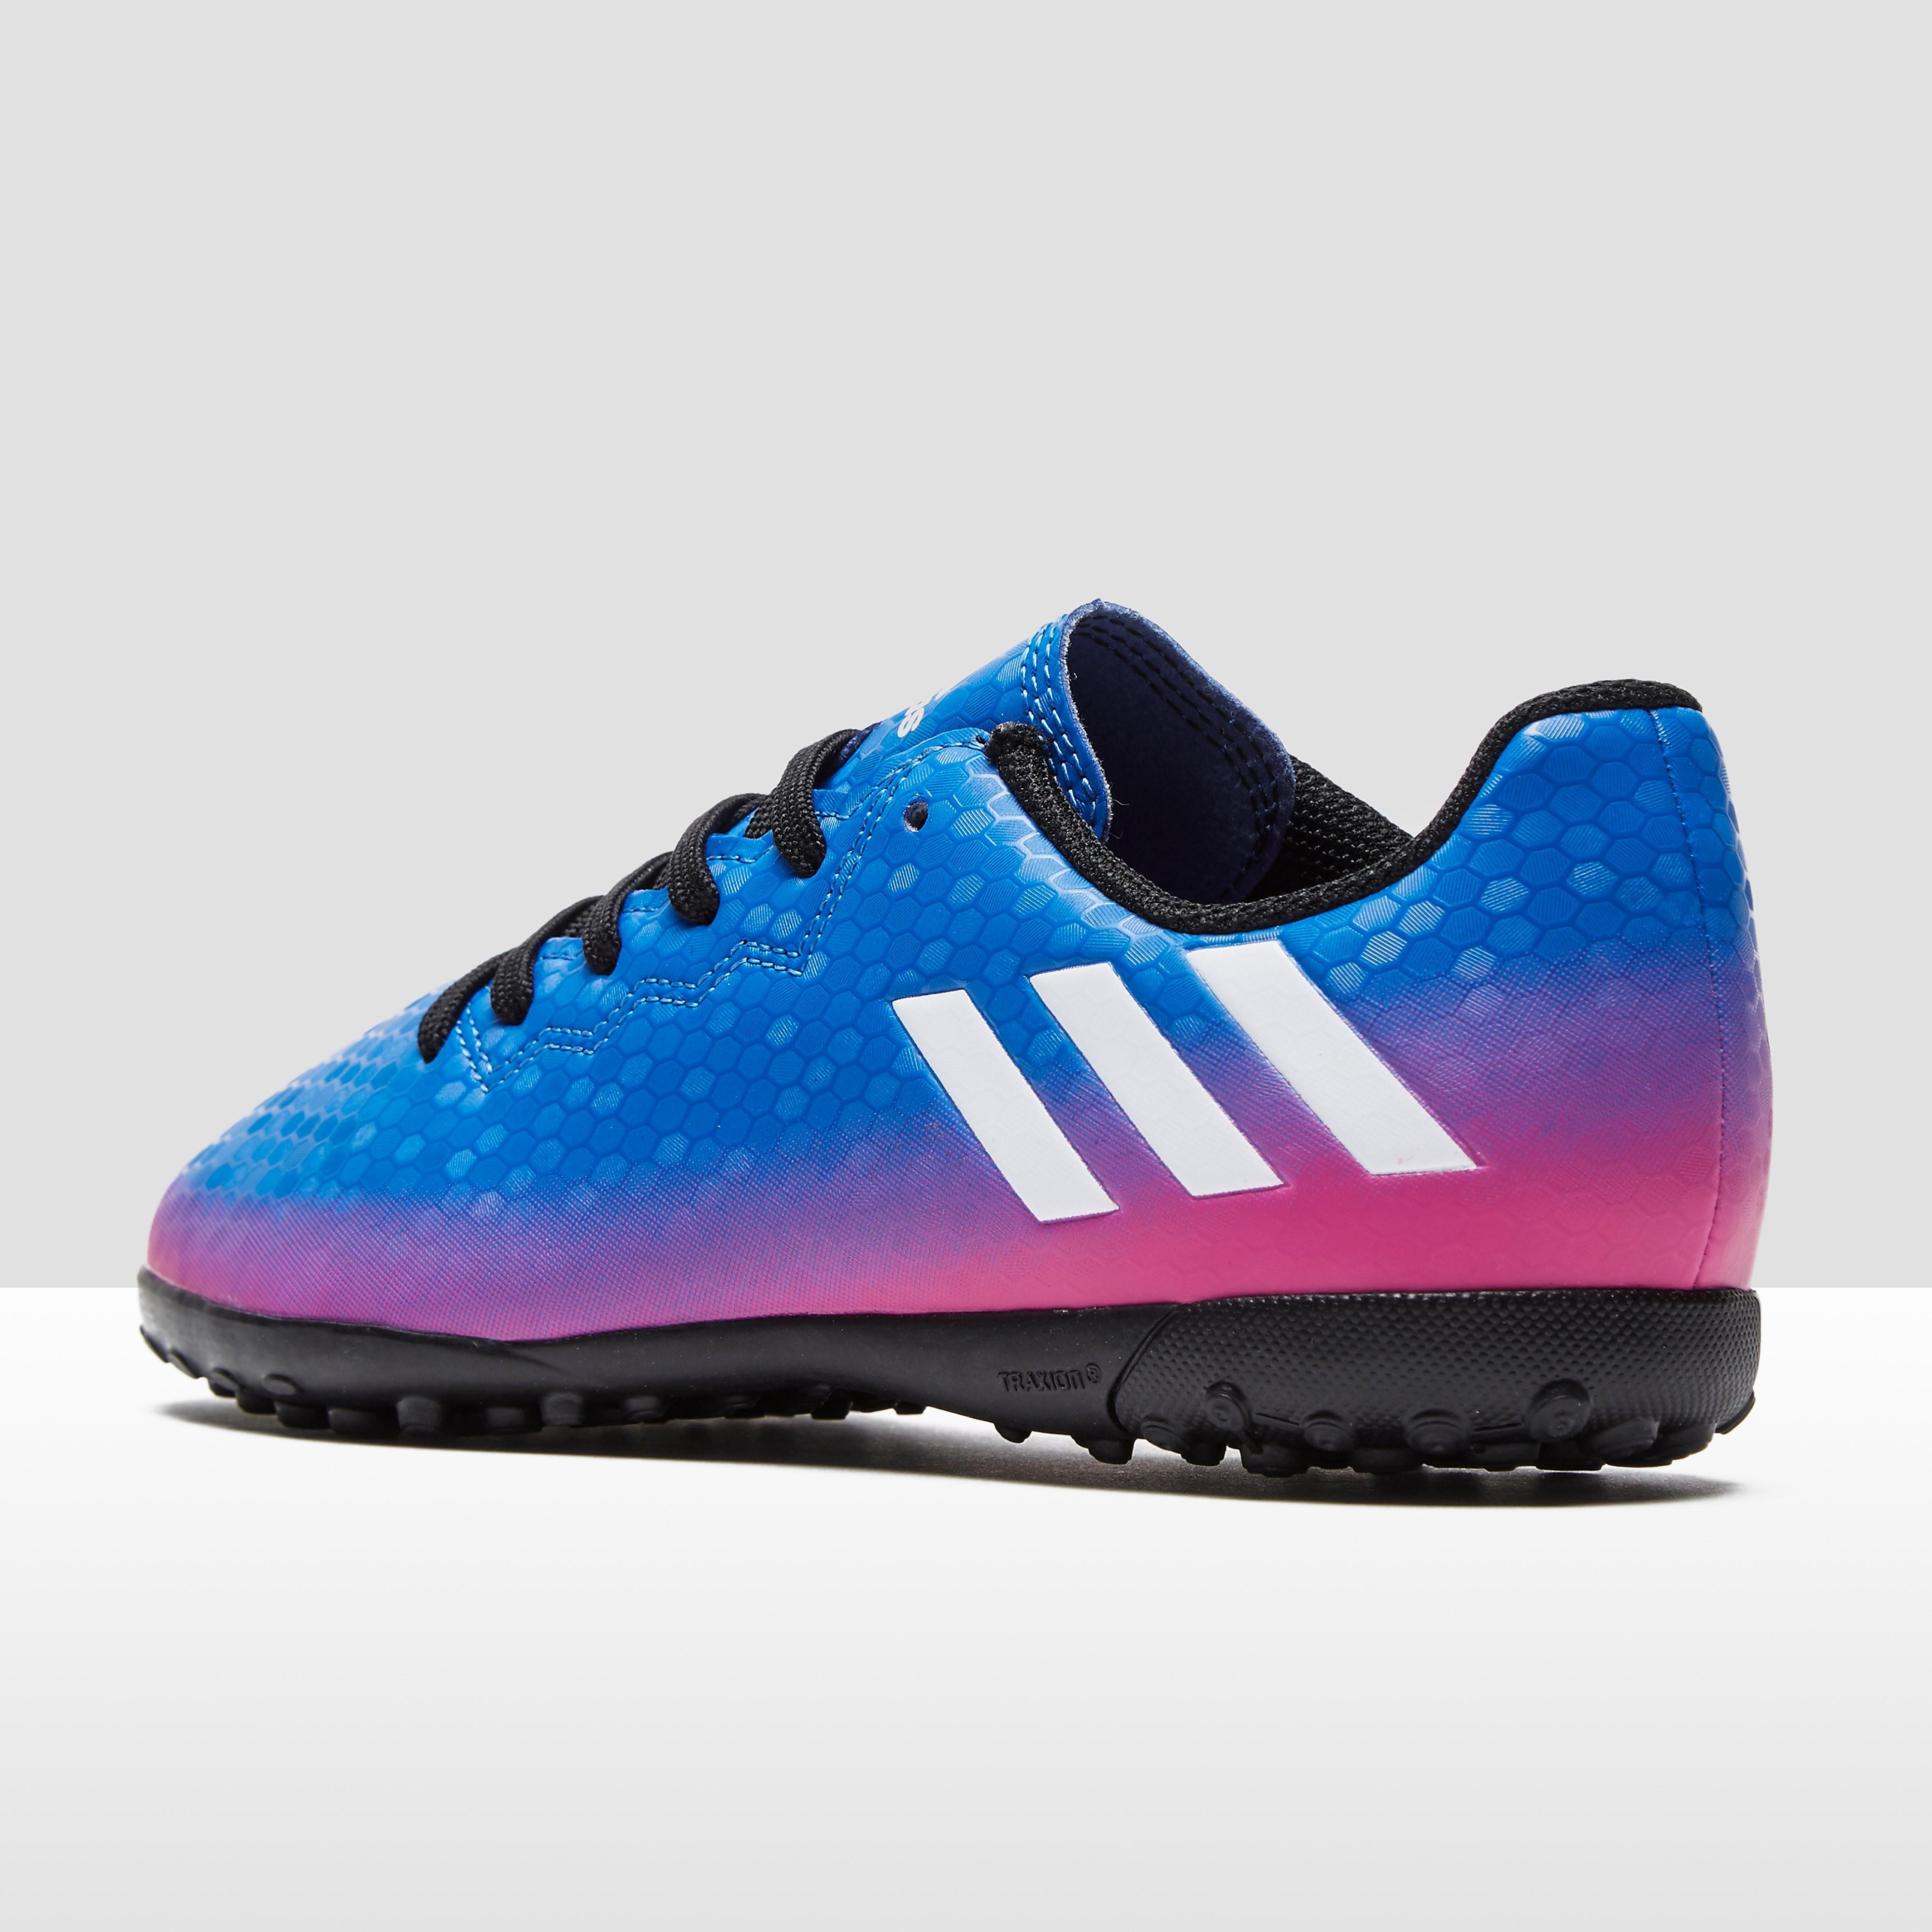 adidas Blue Blast Messi 16.4 TF Children's Football Boots